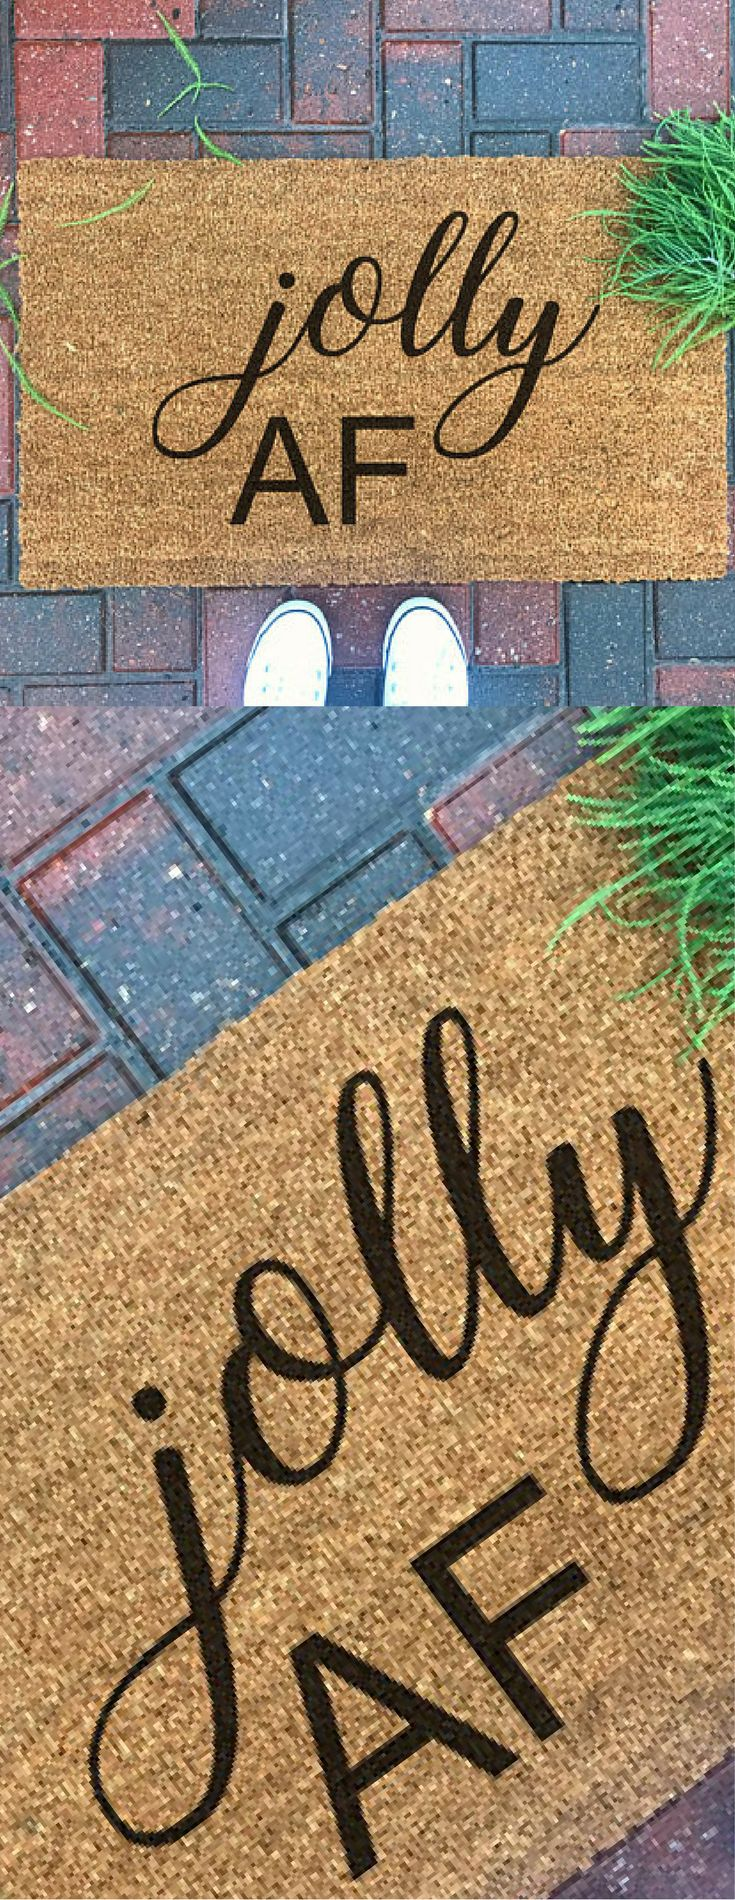 Doormat keep the change you filthy animal doormat photographs : Best 25+ Christmas doormat ideas on Pinterest | DIY Christmas ...